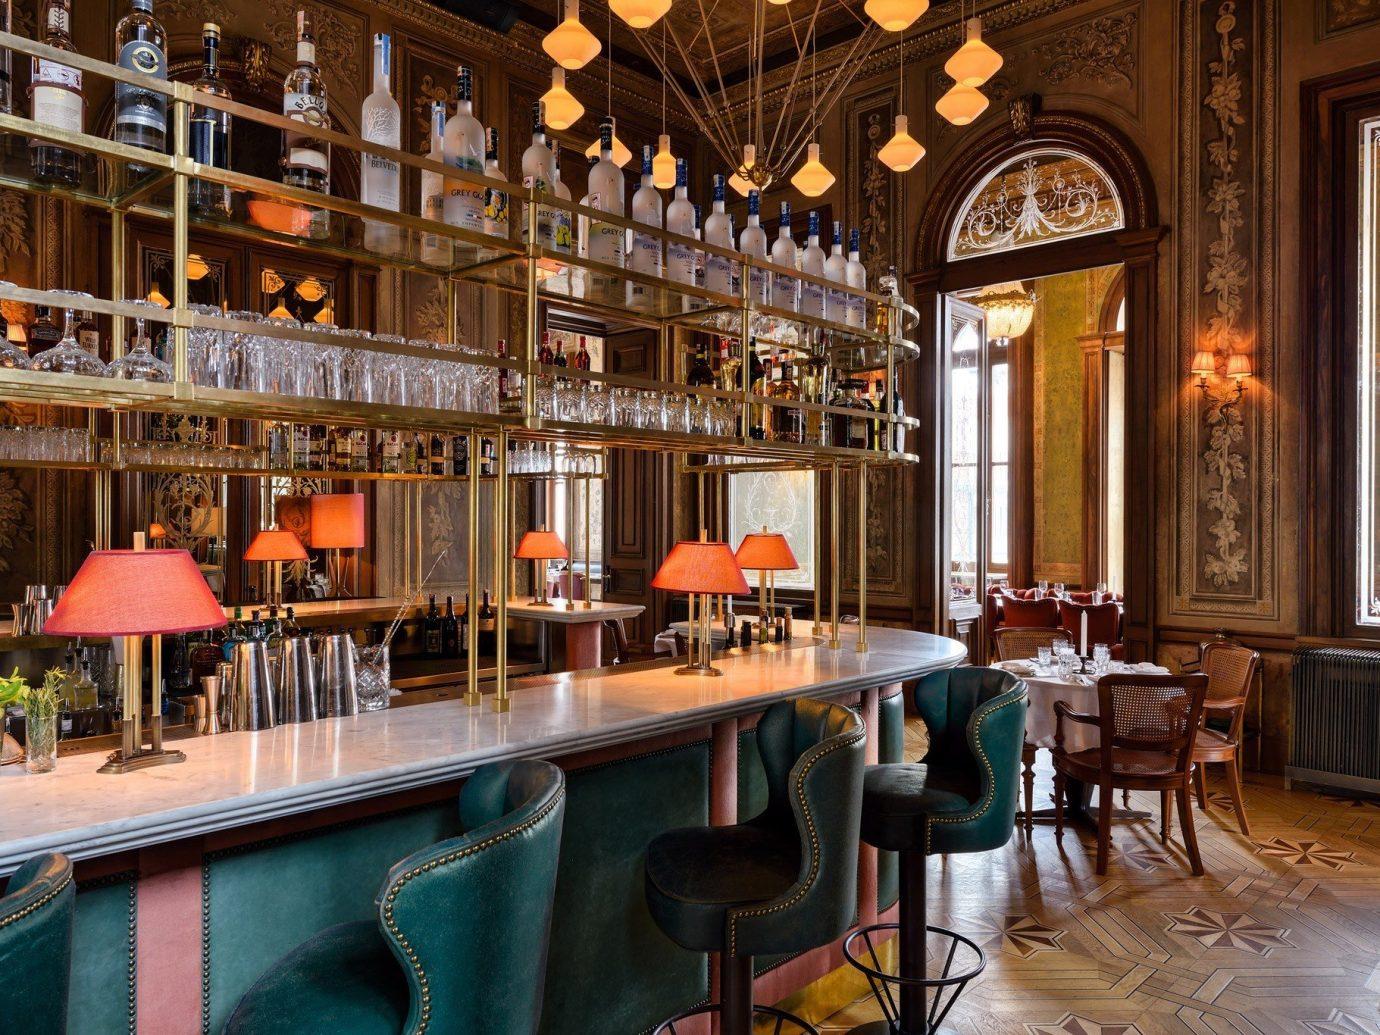 Hotels floor chair indoor property room estate Bar restaurant interior design palace several dining room